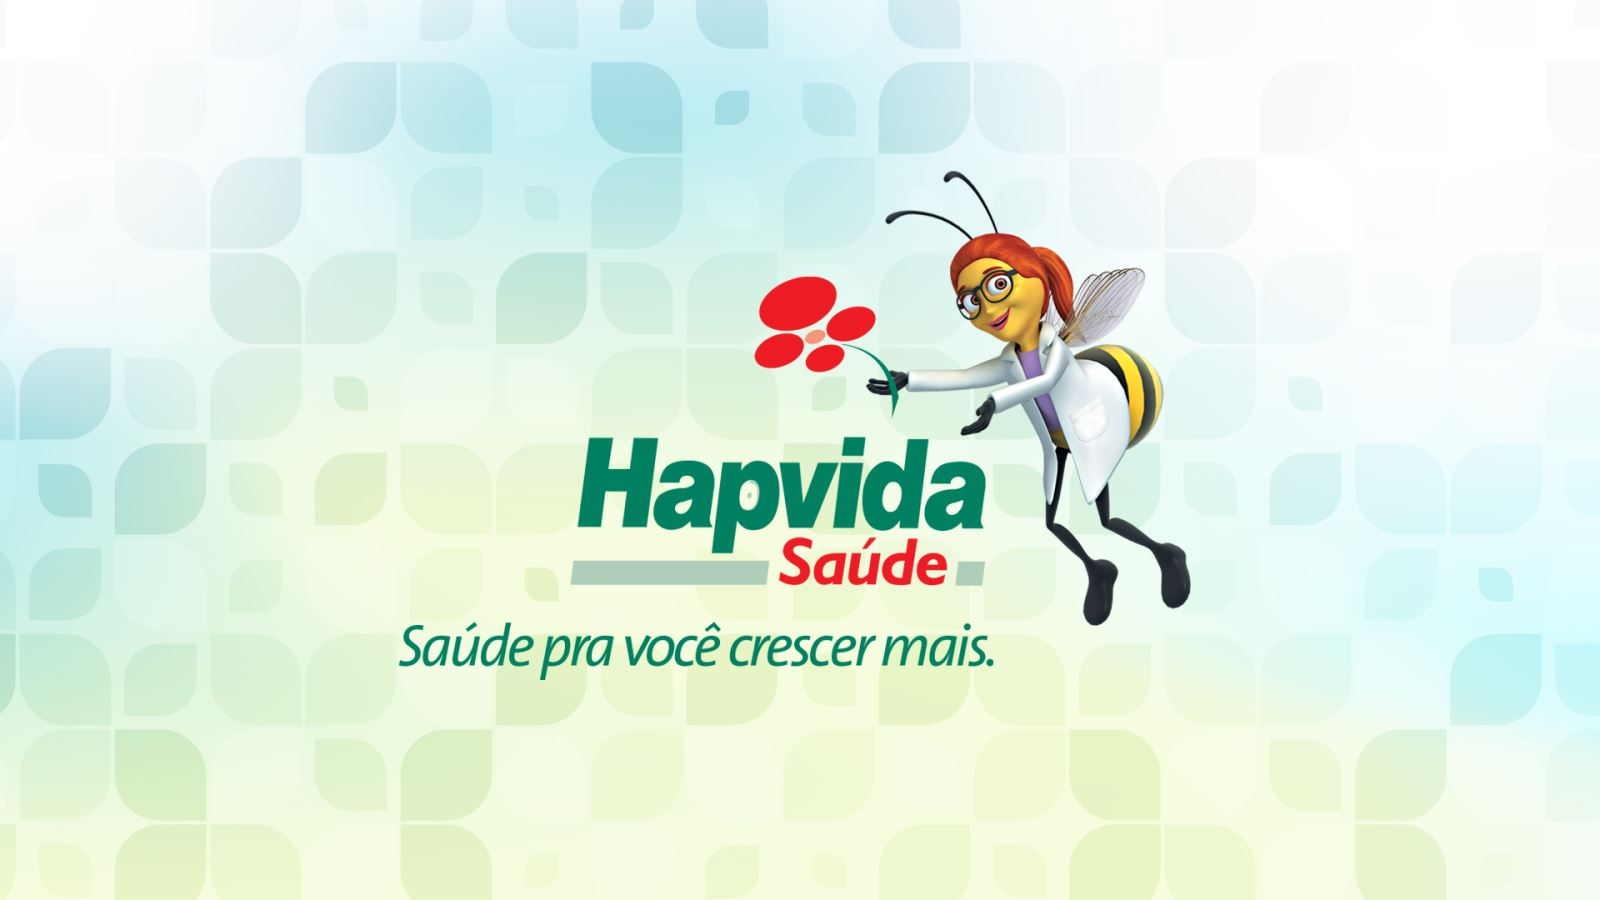 Convênio Médico Hapvida Saúde